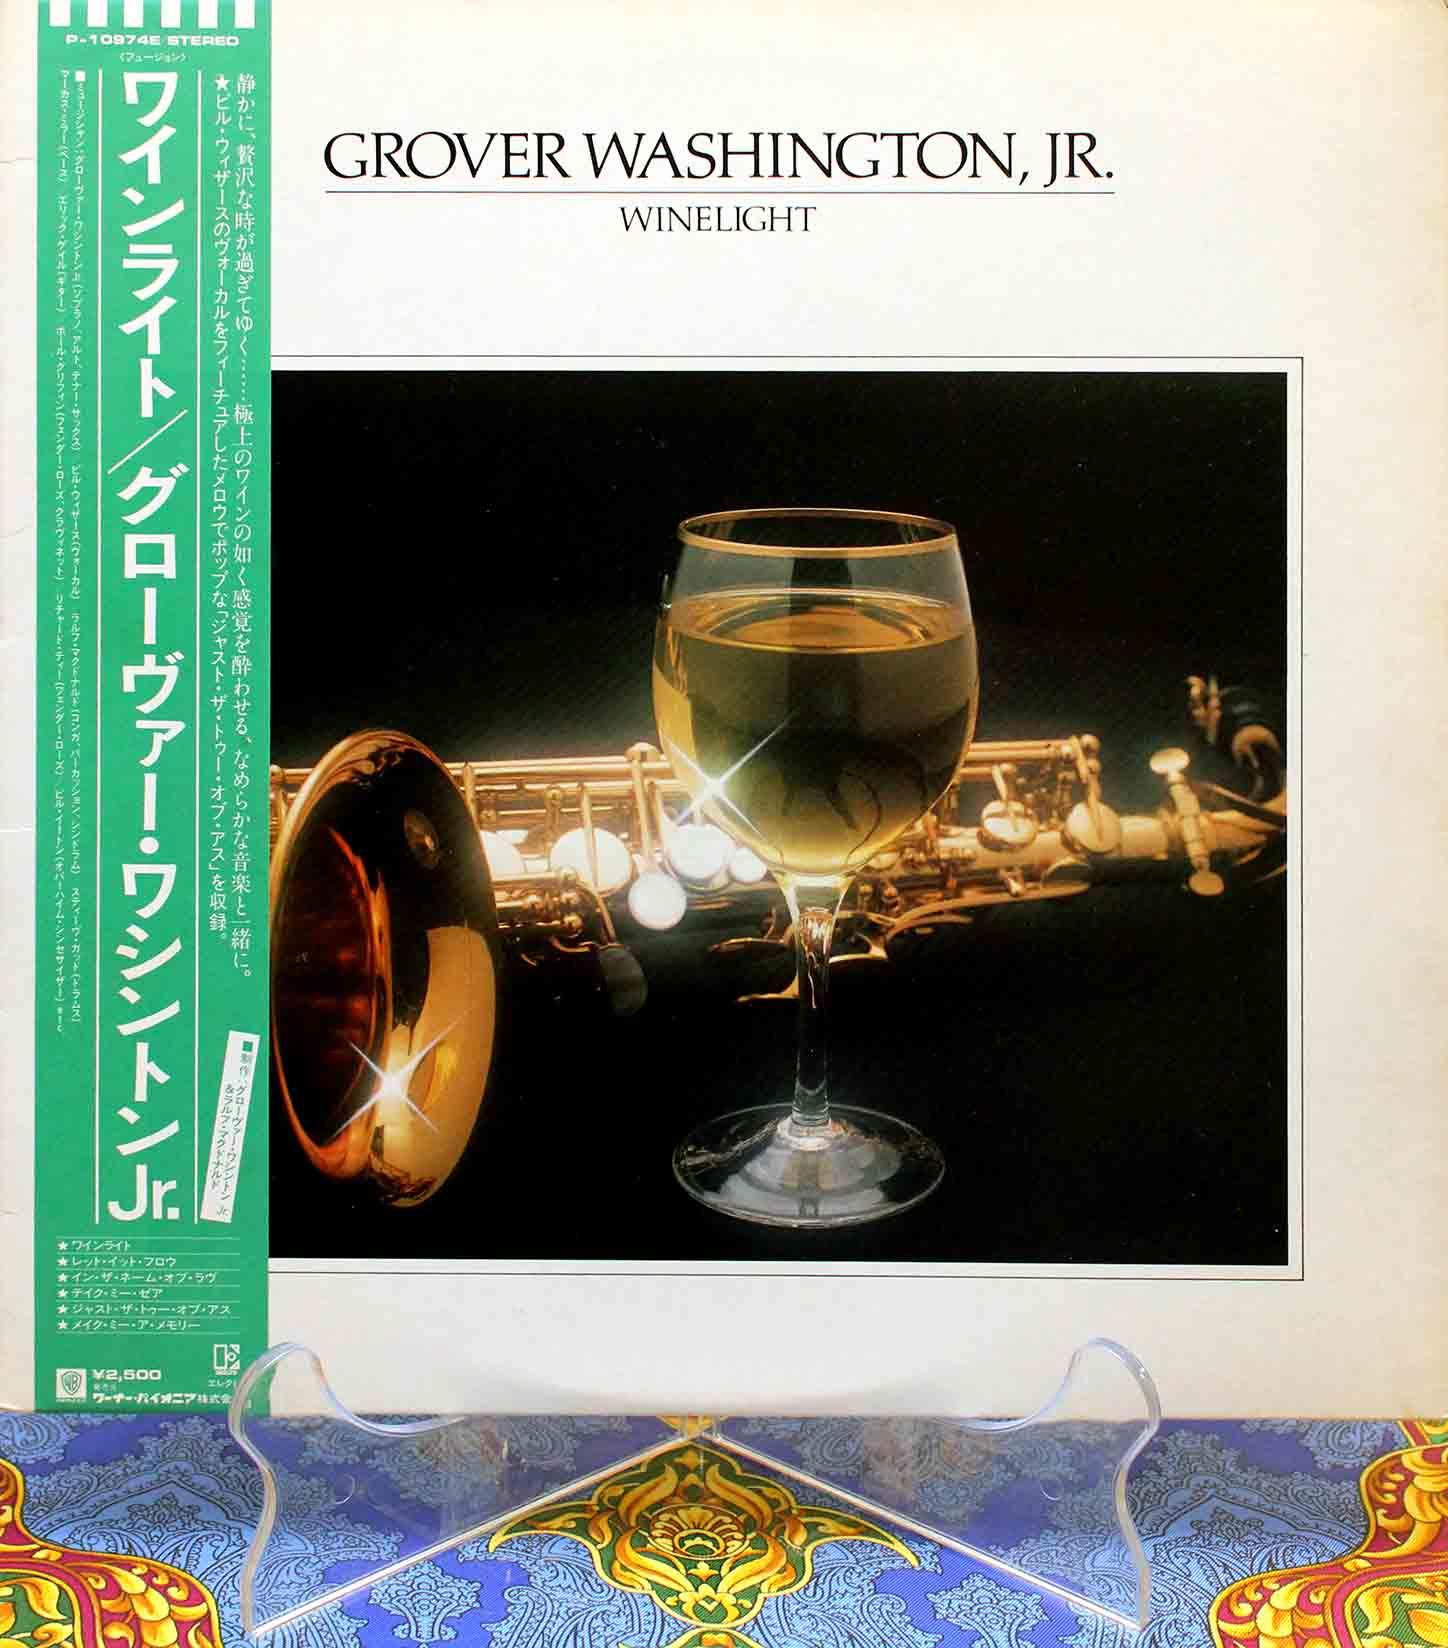 Grover Washington, Jr - Winelight LP 01